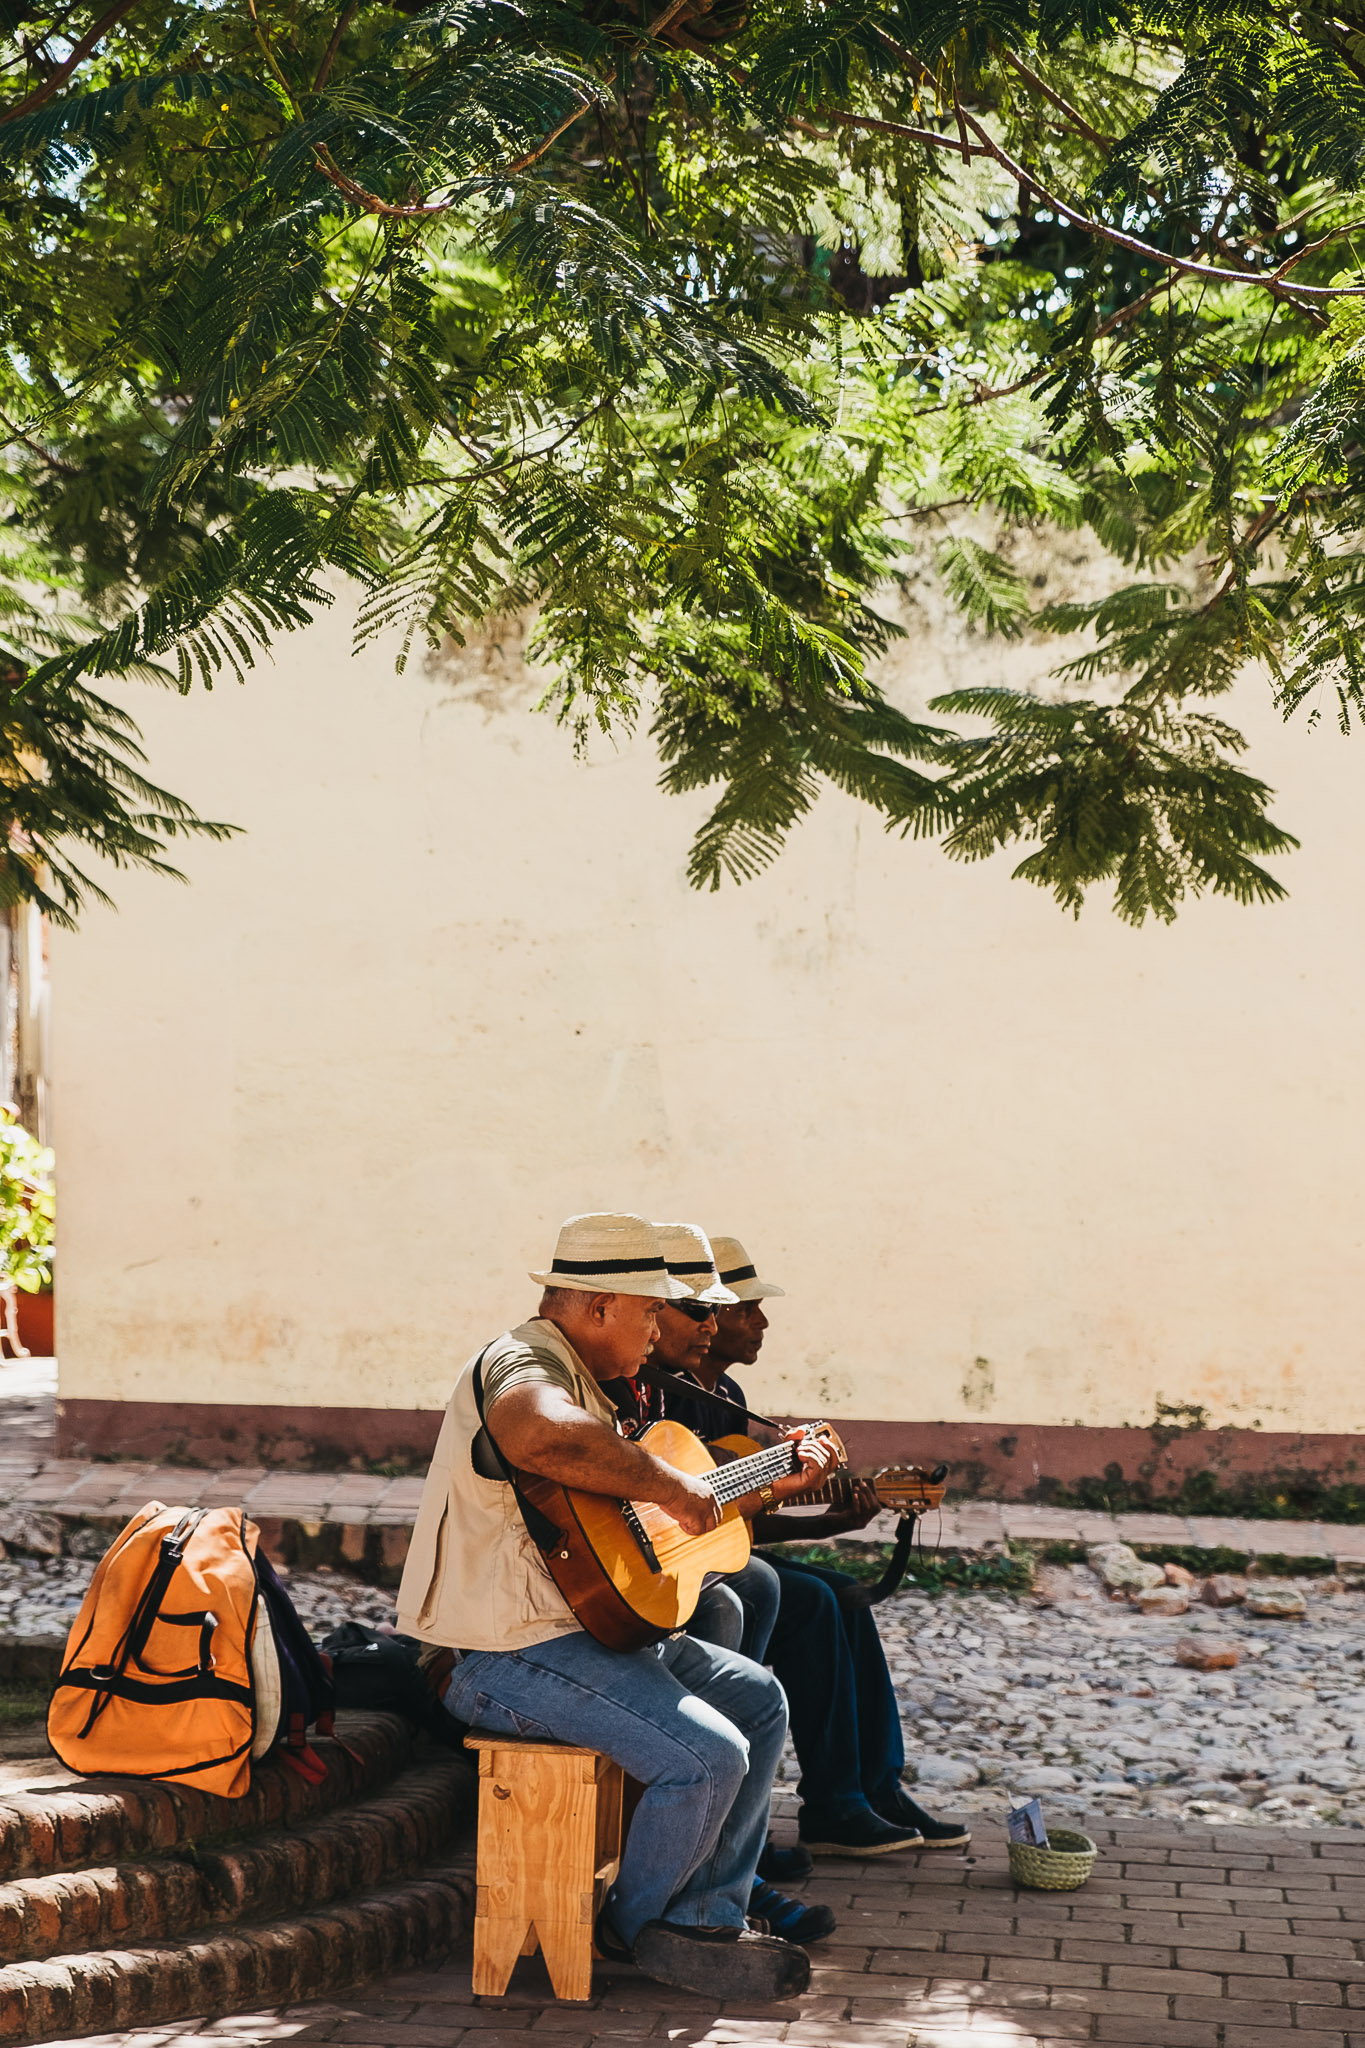 Cuba-2017-12-Trinidad-0313.jpg